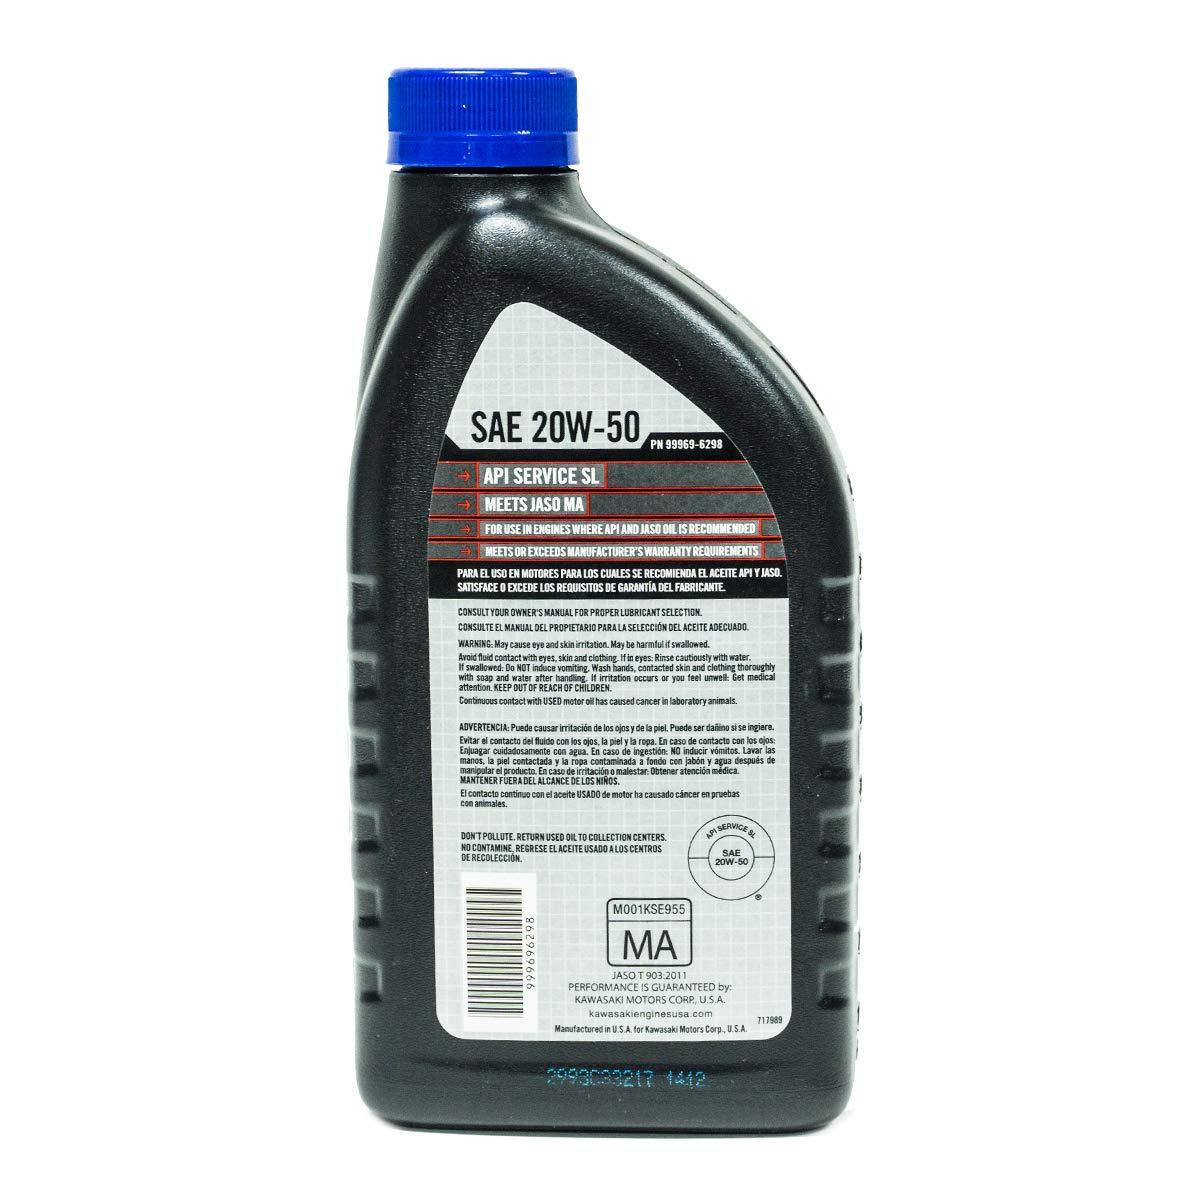 Amazon.com: 6PK OEM Kawasaki 20W50 Motor Engine Oil 99969-6298 & 49065-7007 Oil Filter Kit: Garden & Outdoor